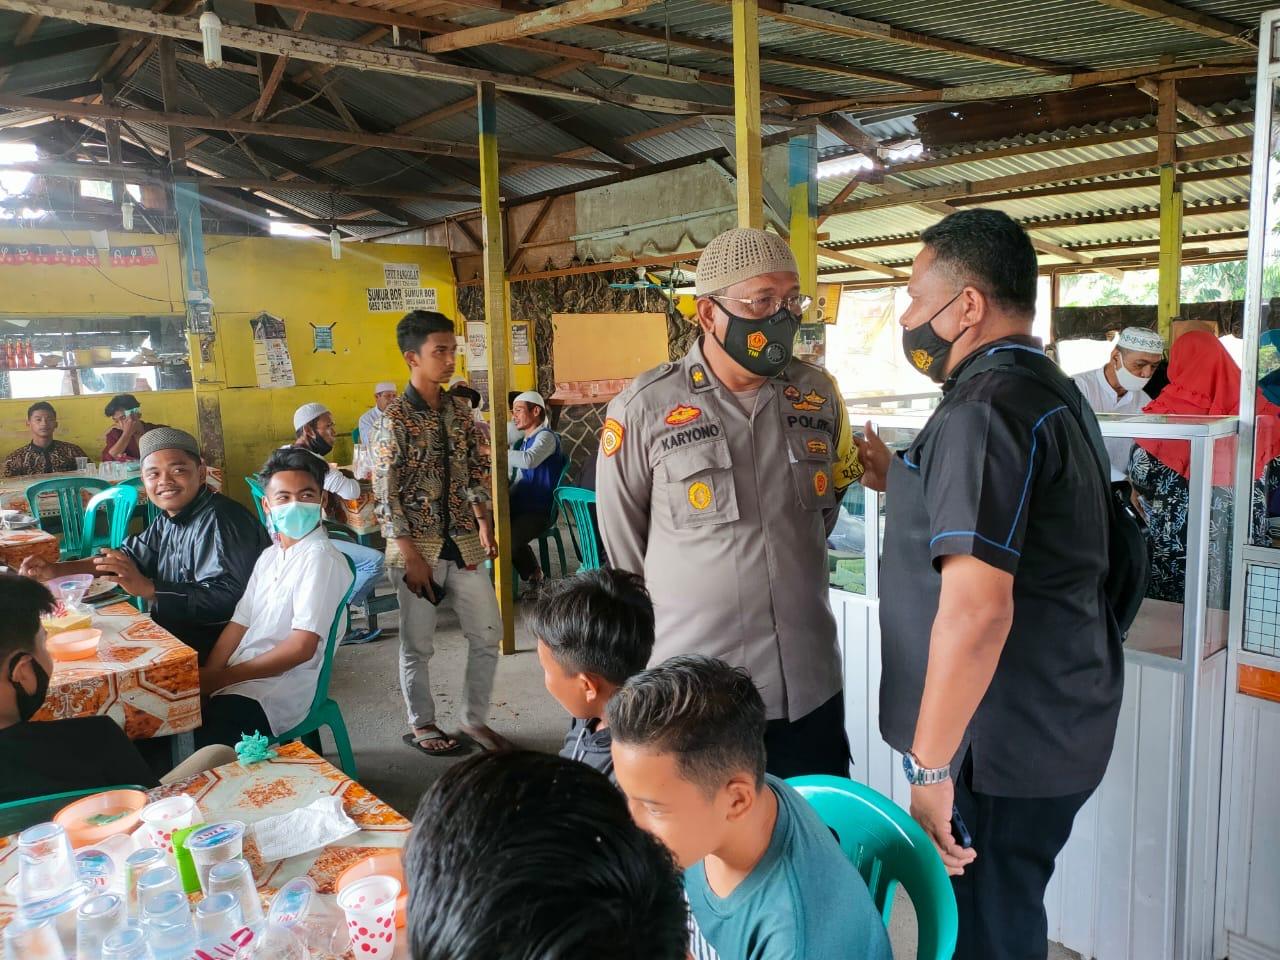 Jumat Barokah Polres Kampar, Sediakan Makan Siang Bagi Mahasiswa dan Masyarakat